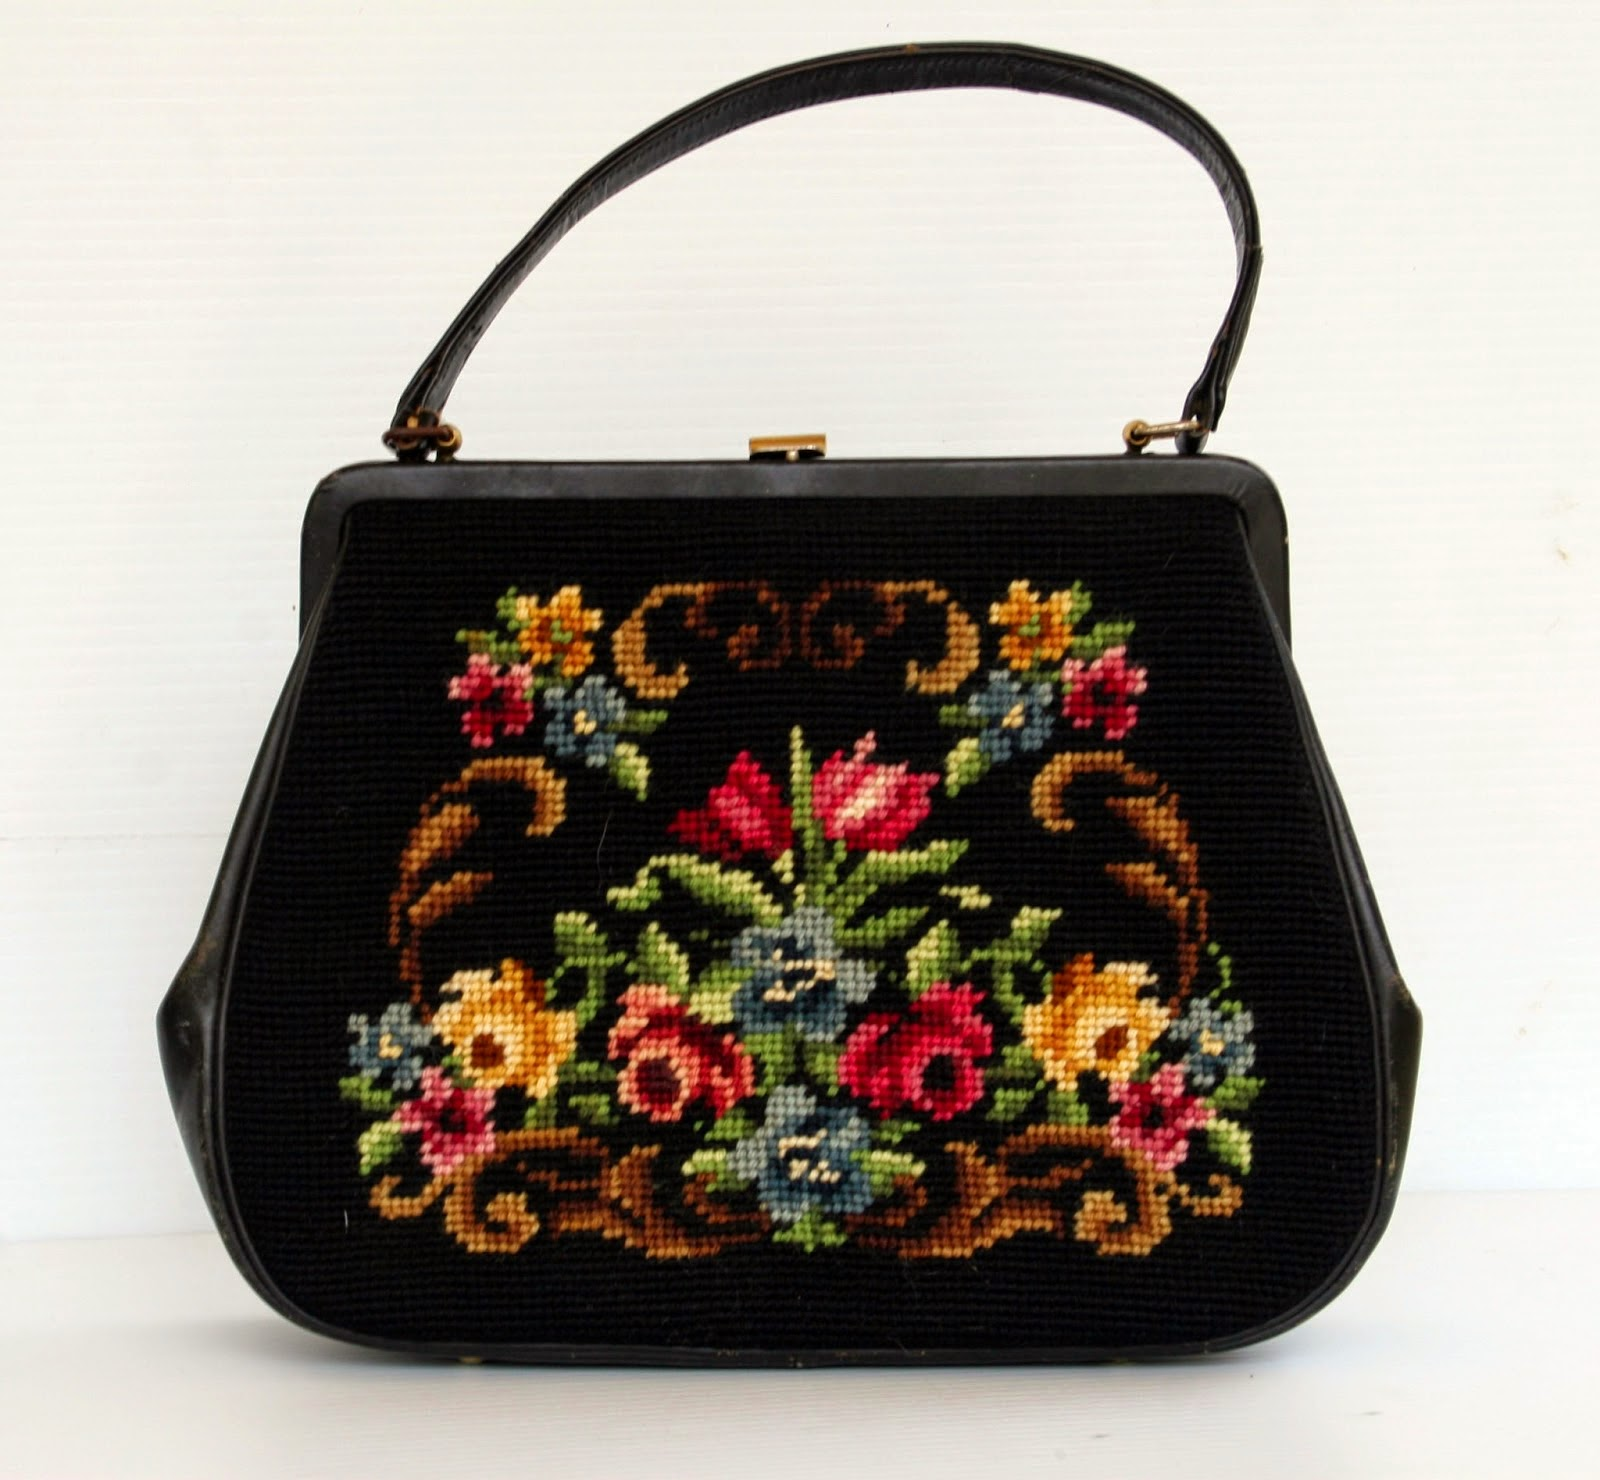 Vizitati blog-ul nostru cu genti vintage! / Visit our Vintage Bags Blog!